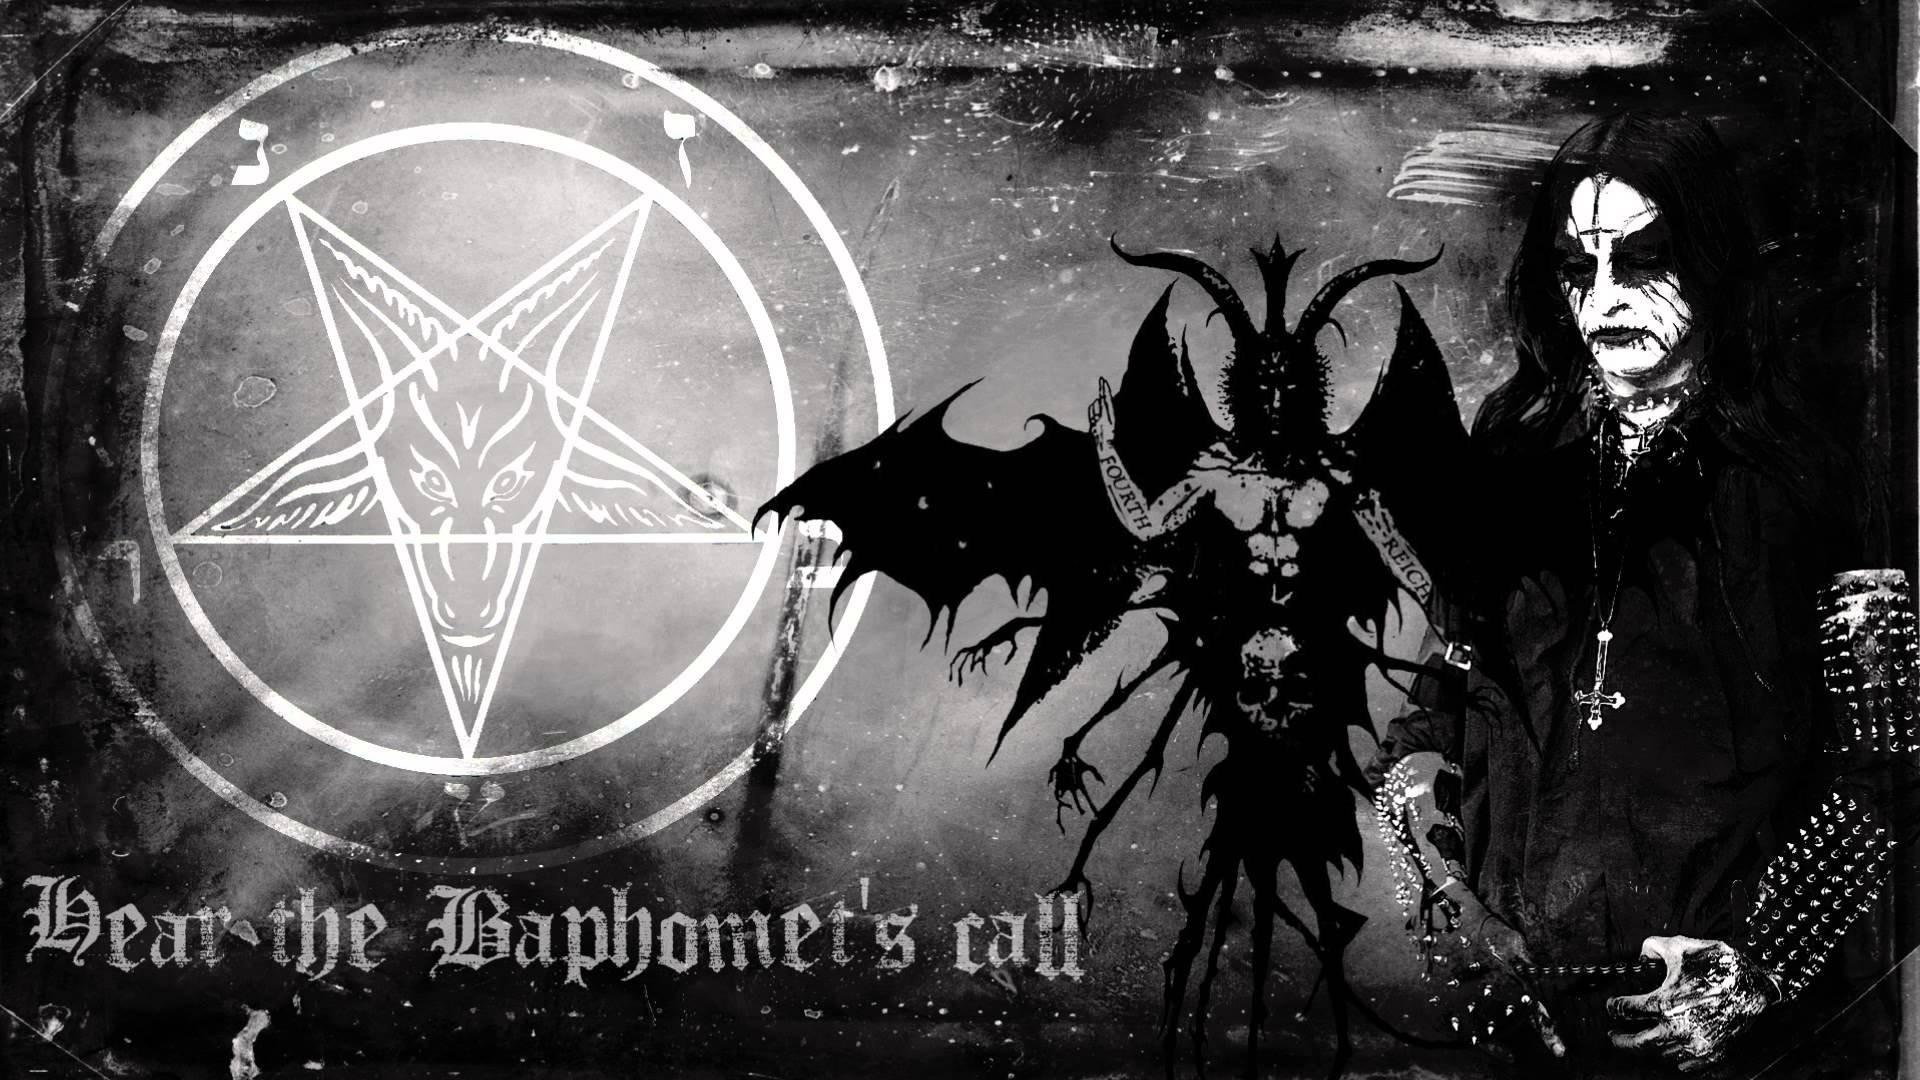 BEHEXEN black metal heavy poster dark occult satanic pentagram h wallpaper